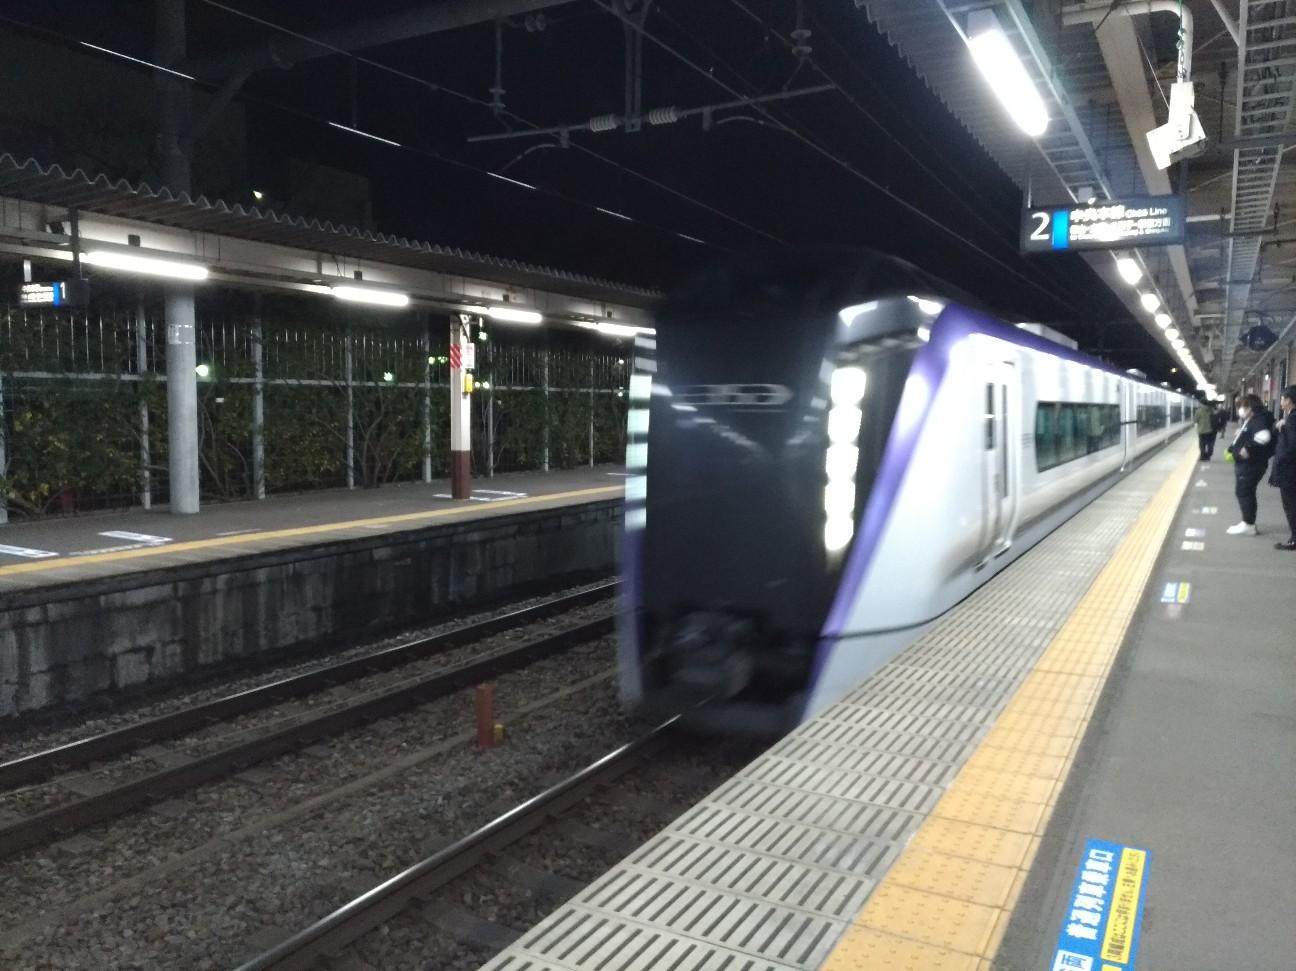 f:id:HKT1989:20191210133314j:image